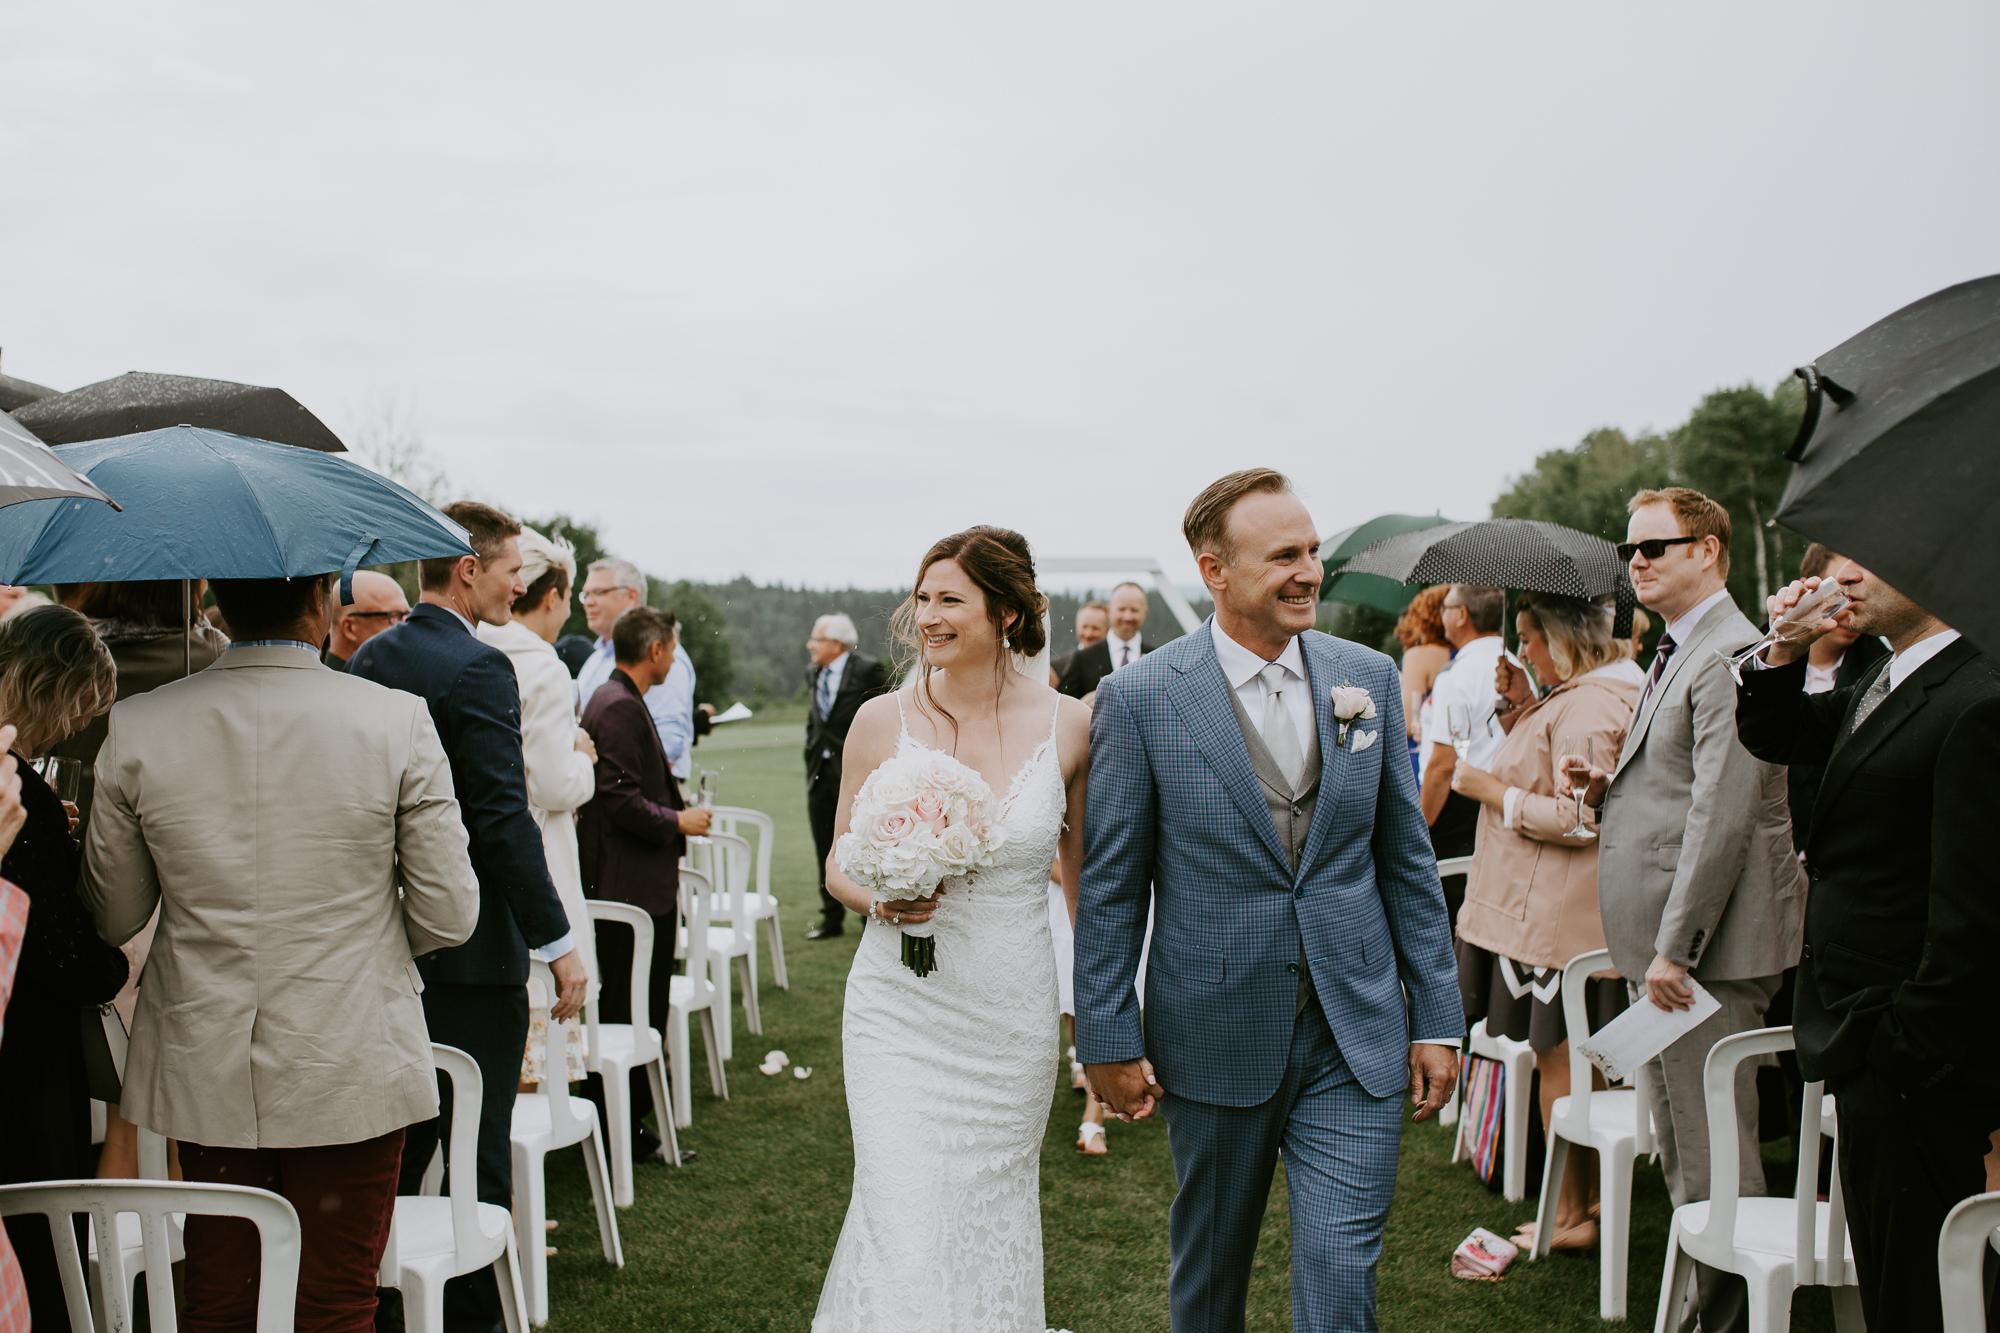 Priddis-Wedding-Photographer-JG-32.jpg